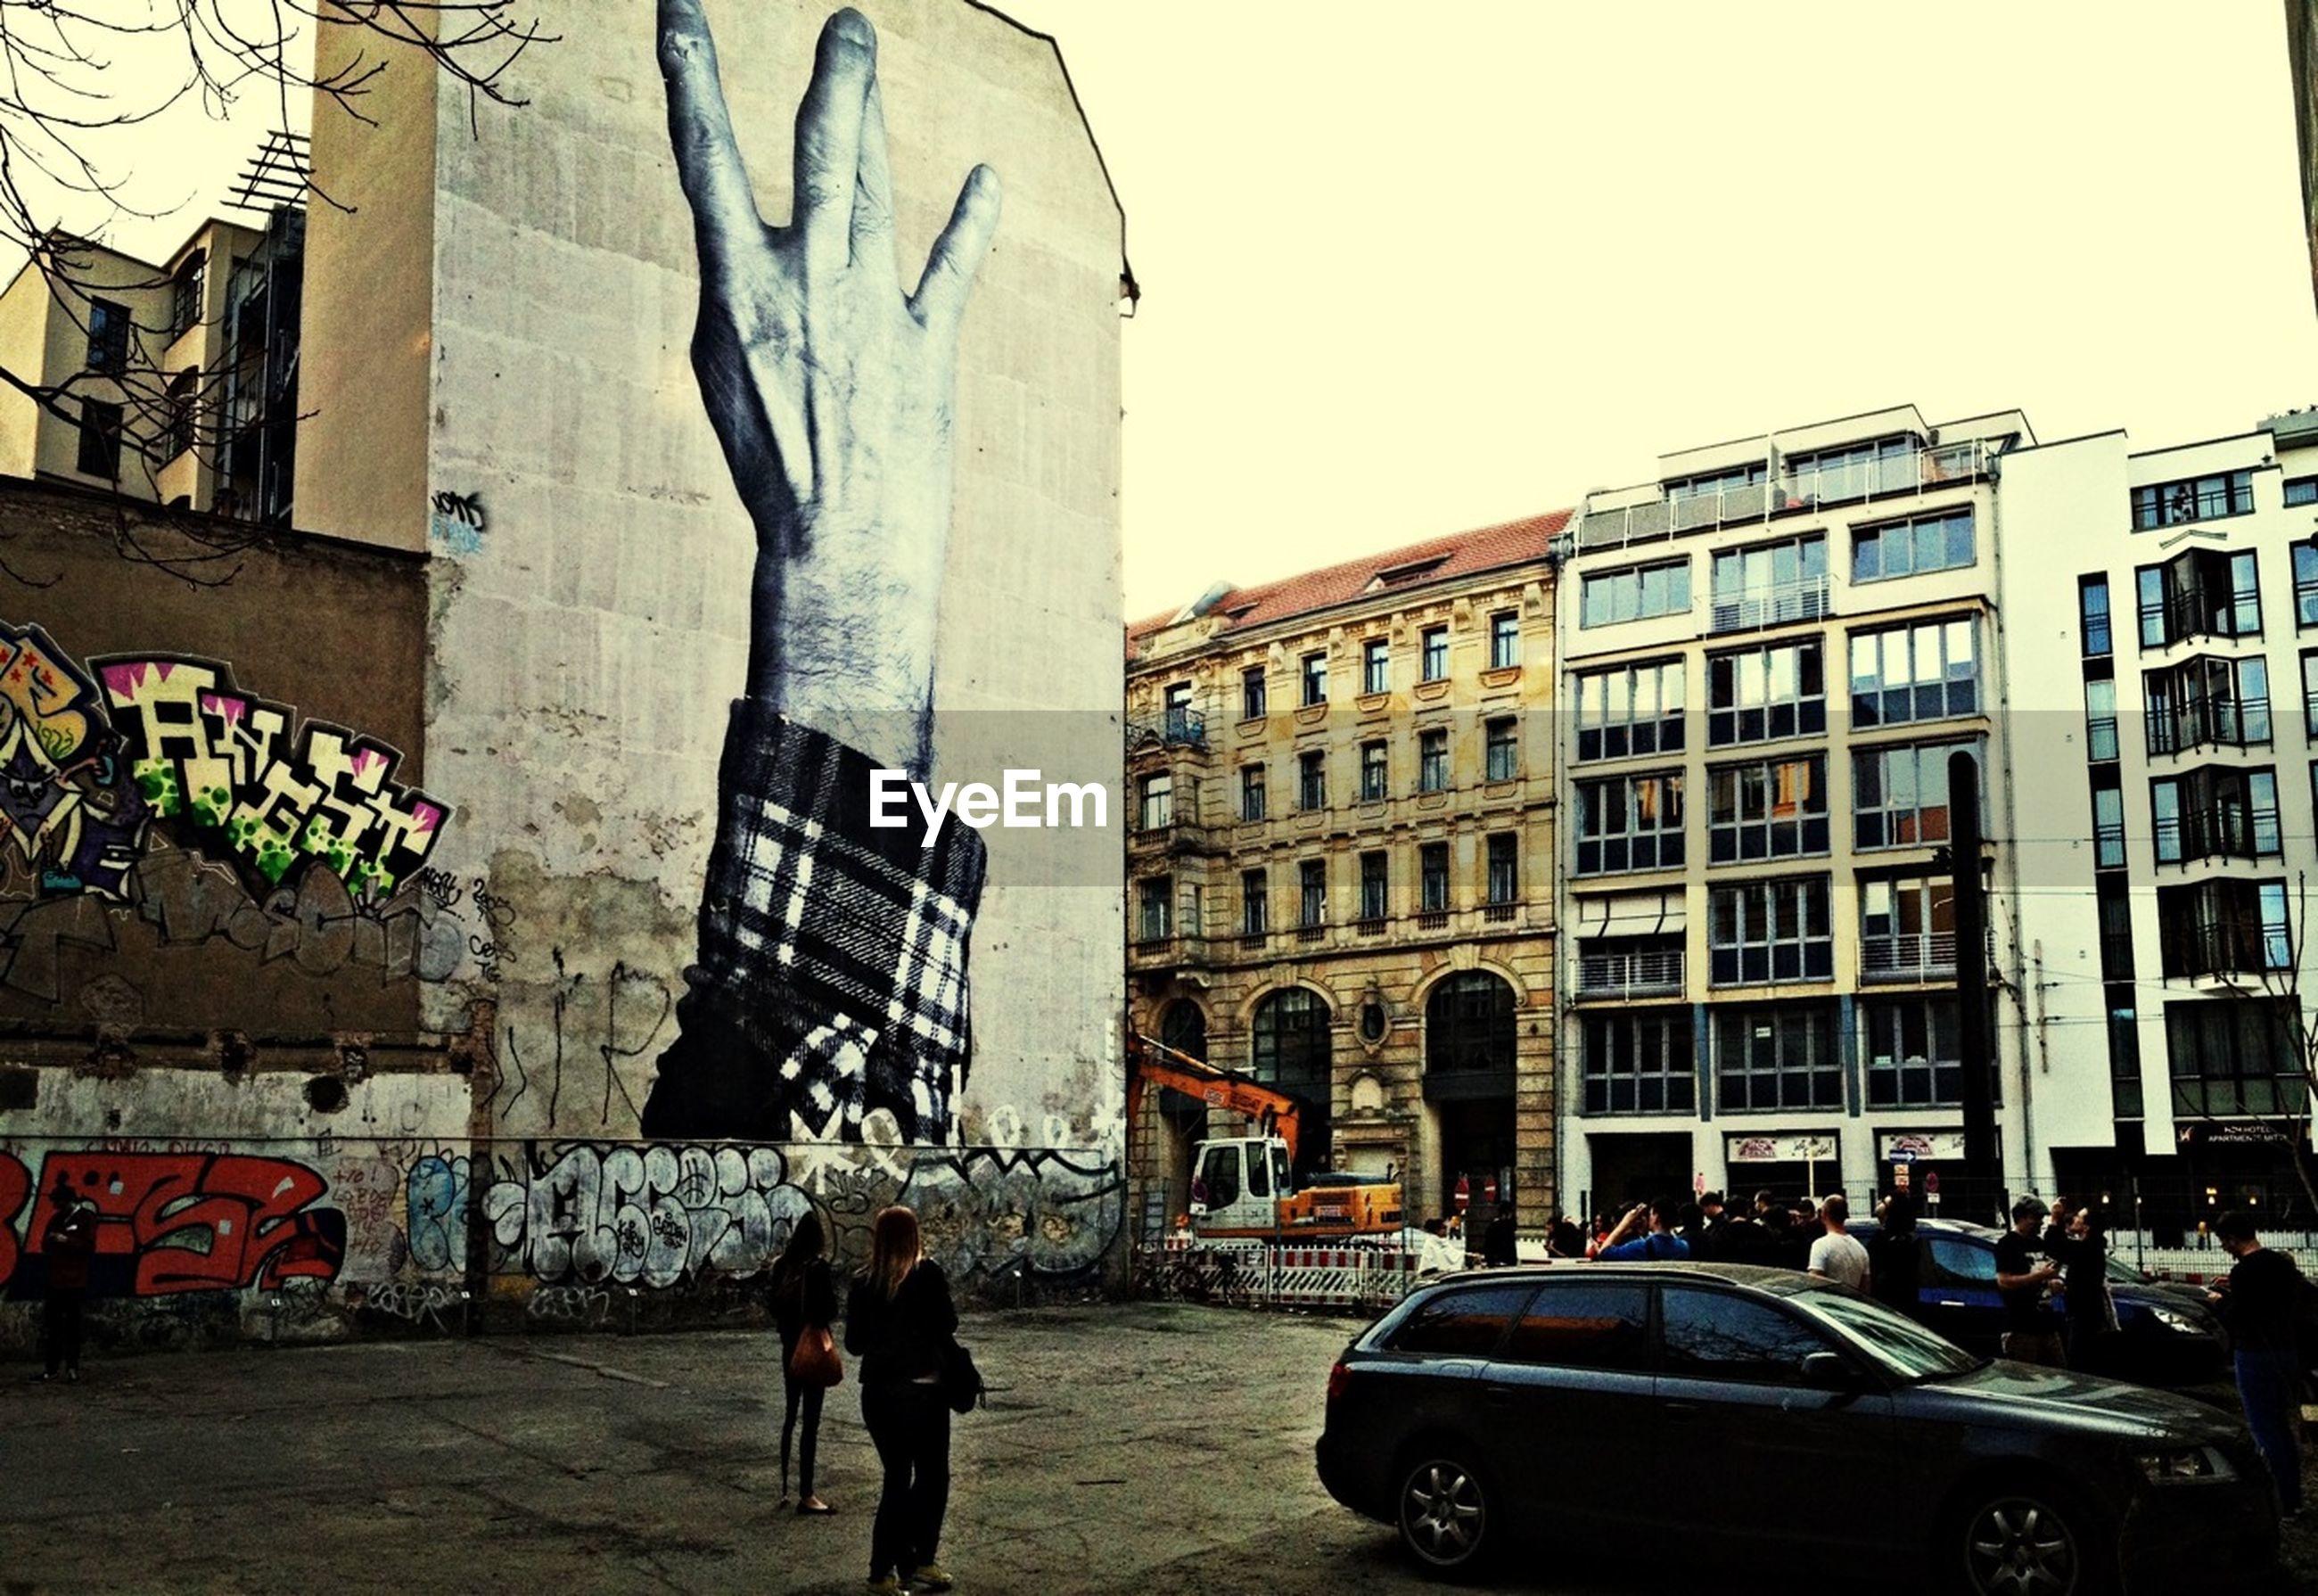 Graffiti on city building